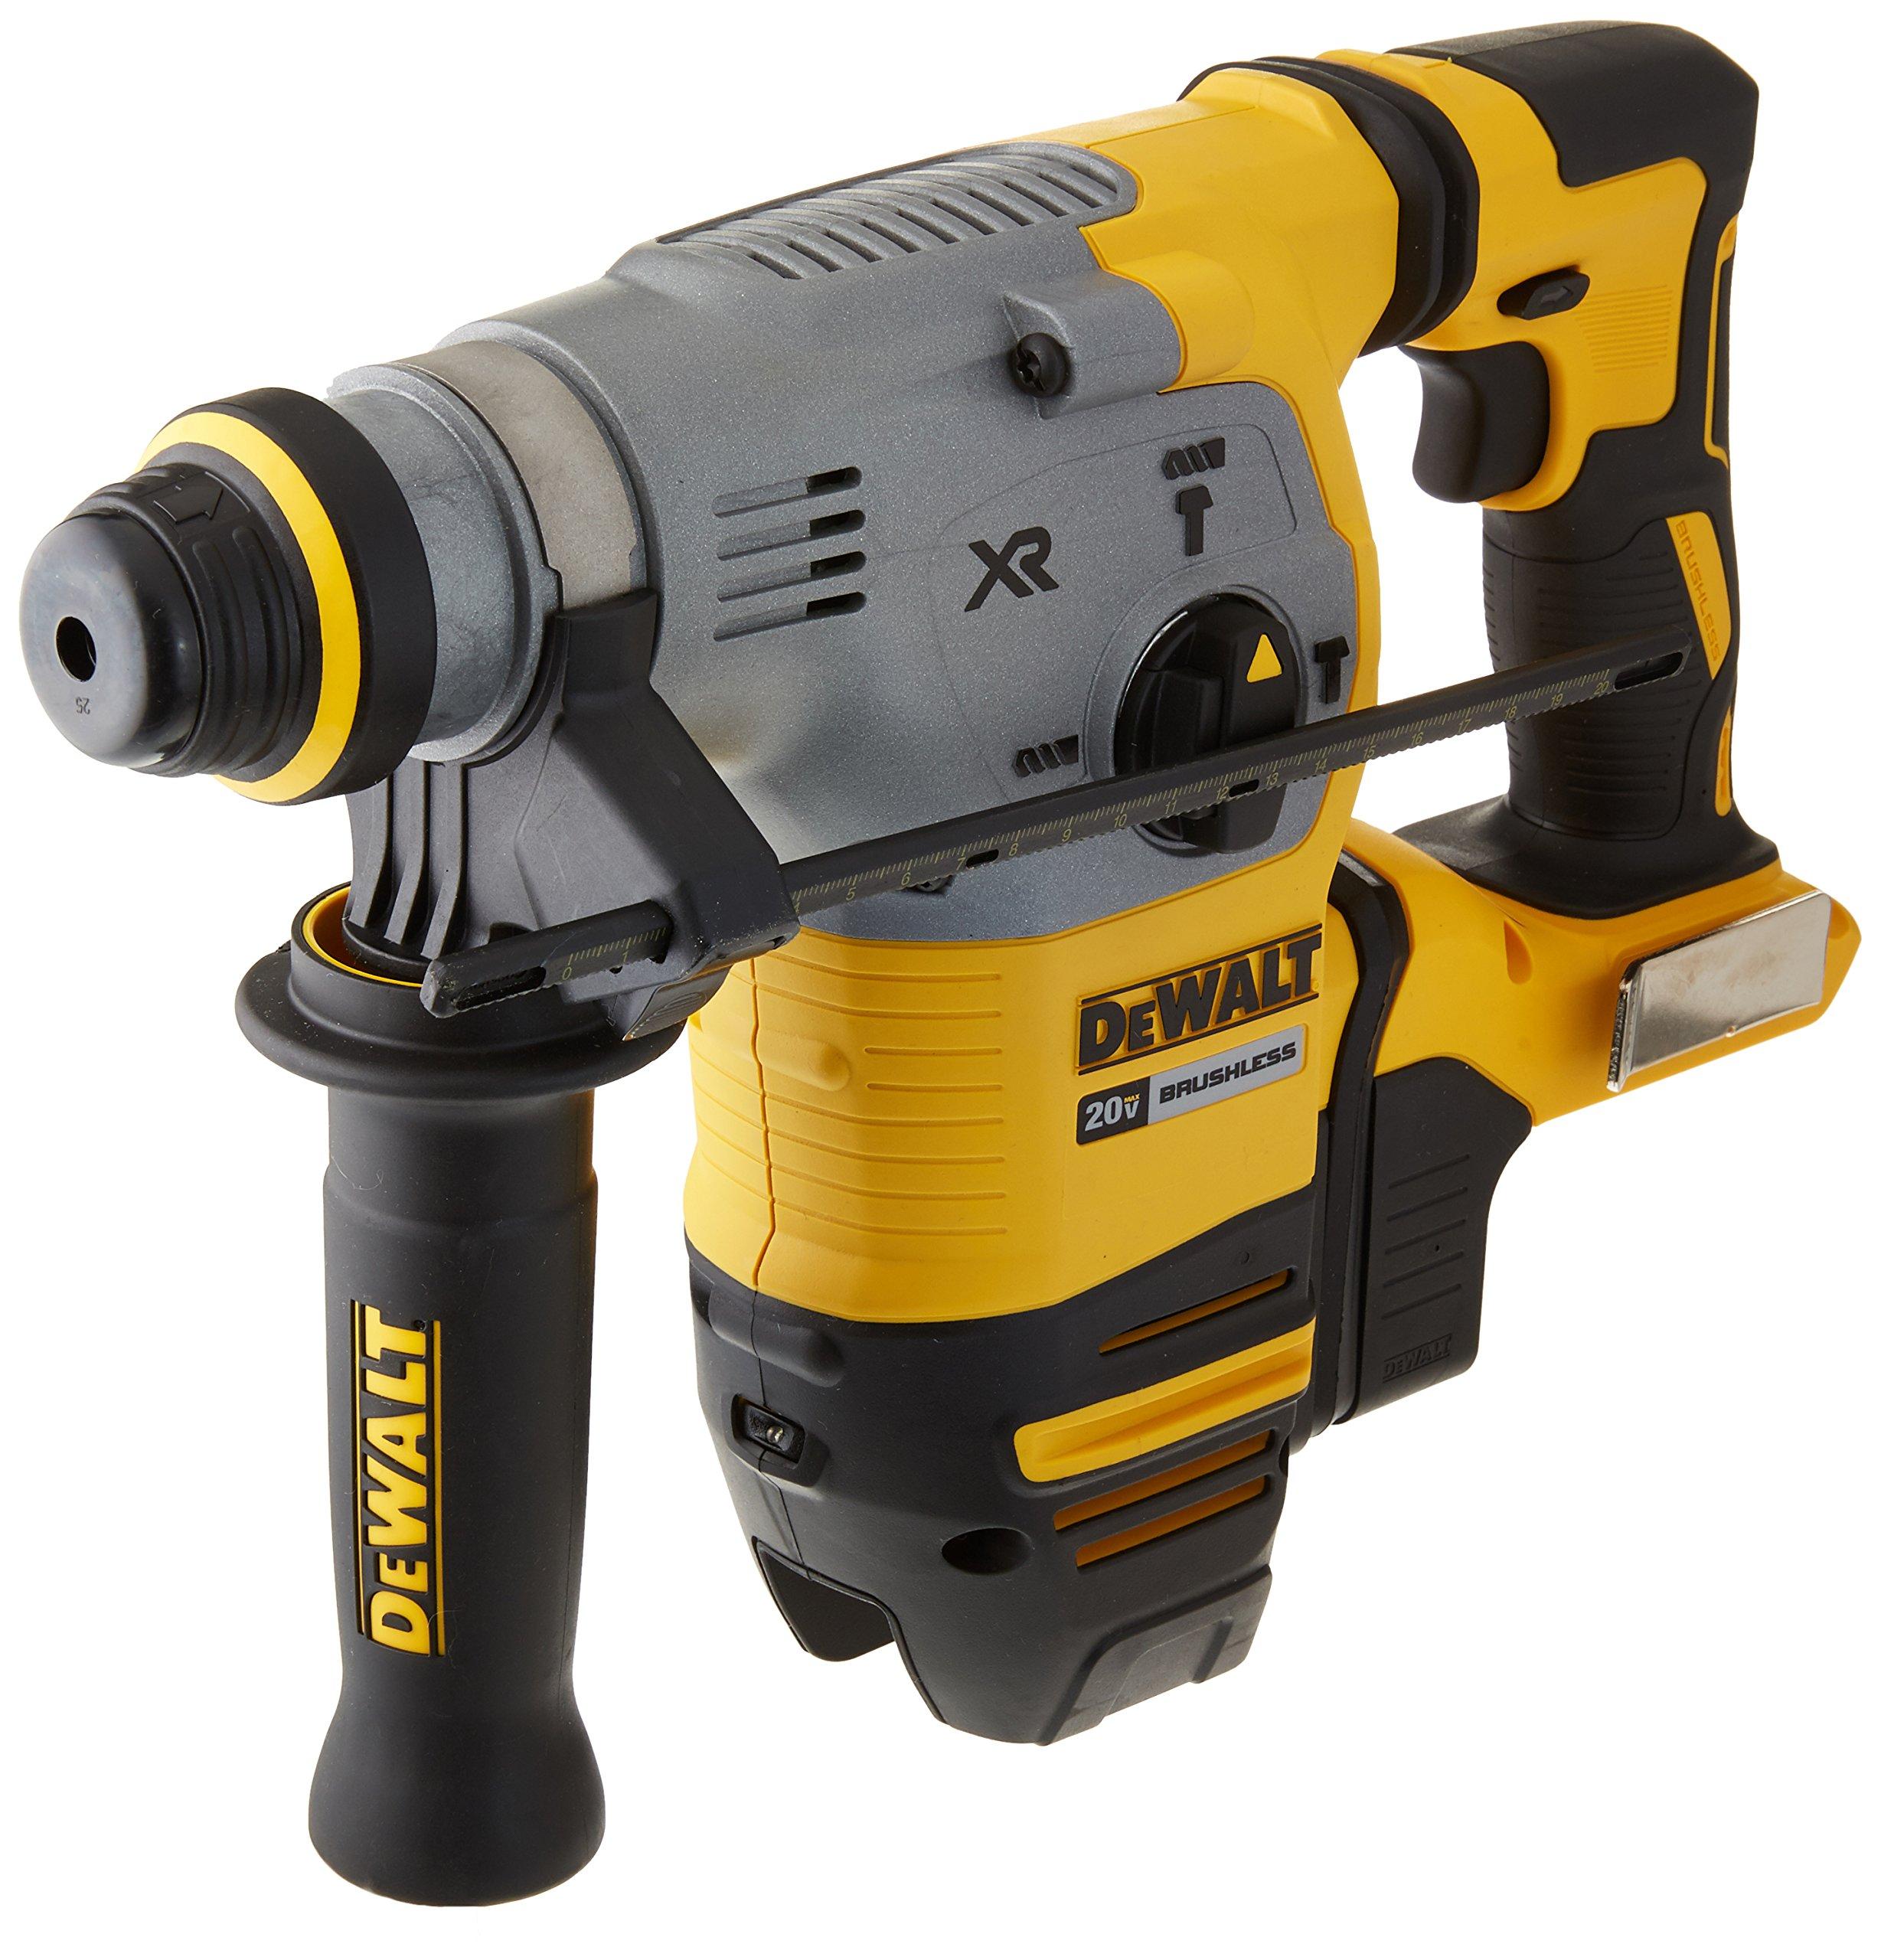 "DEWALT DCH293B 20V Max XR Brushless 1-1/8"" L-Shape SDS Plus Rotary Hammer Drill"